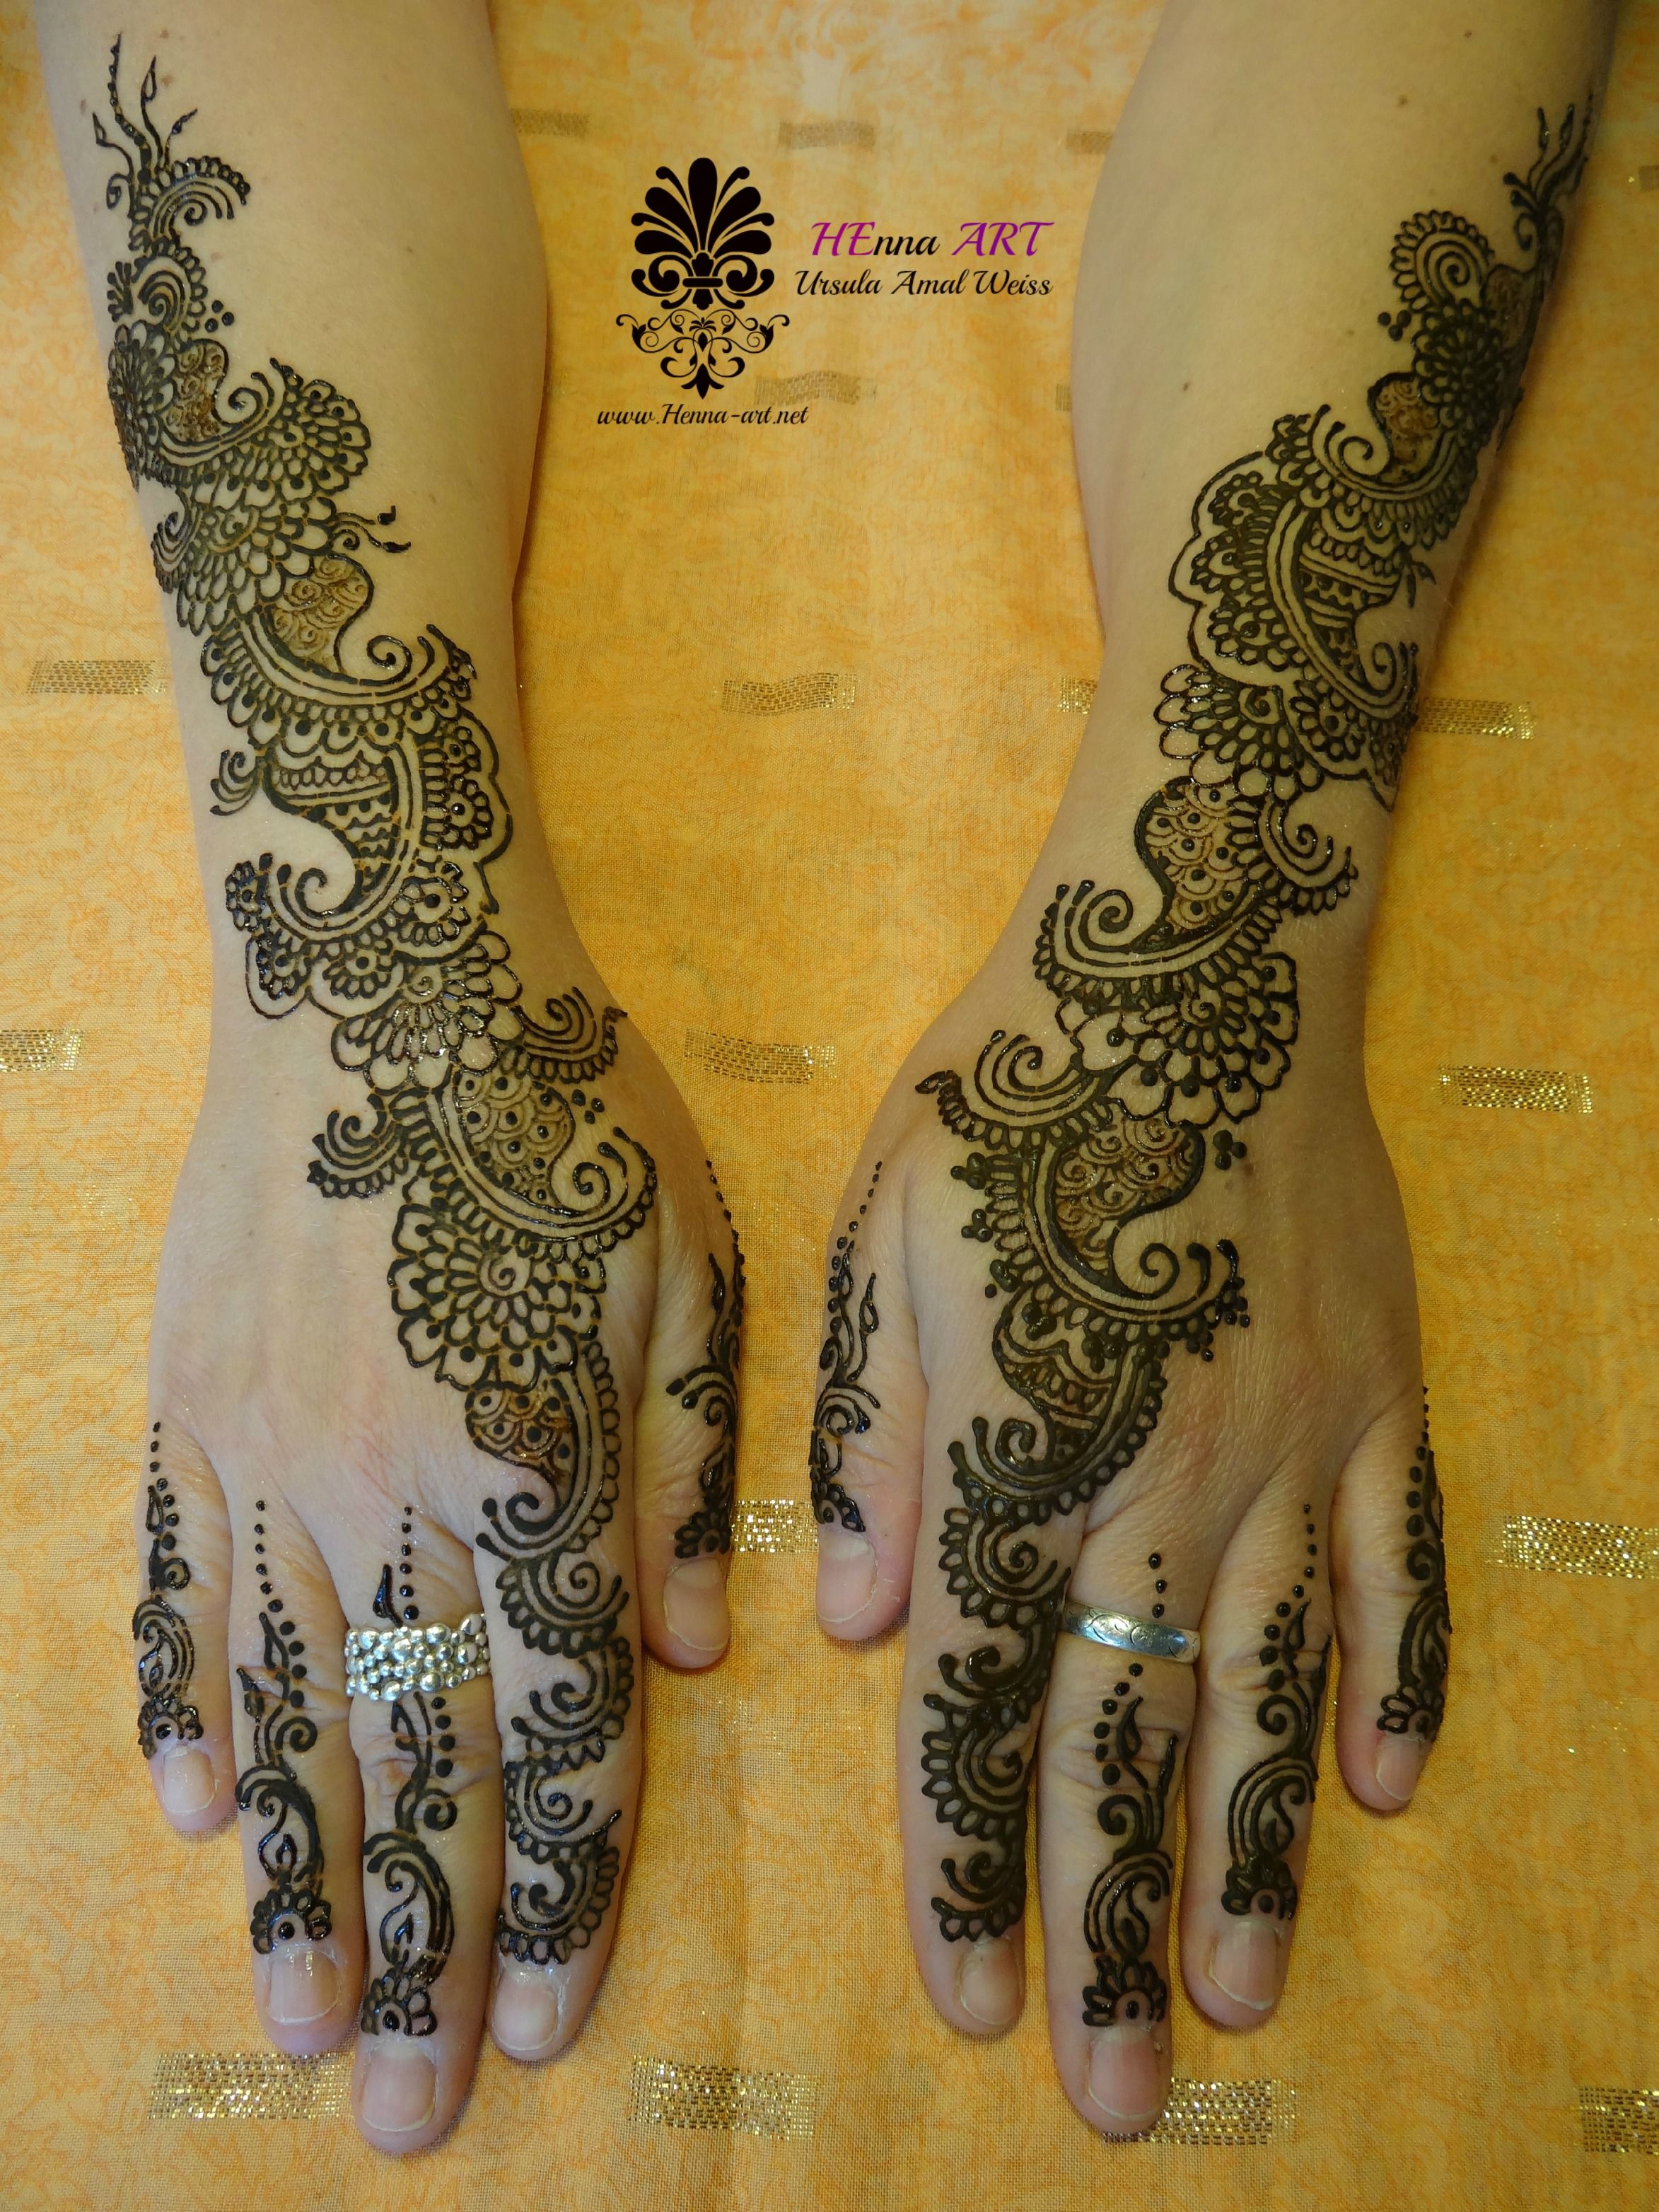 Henna Tattoo Kaufen Basel: A Henna For A Nice Lady Who Wanted To Treat Herself Nice